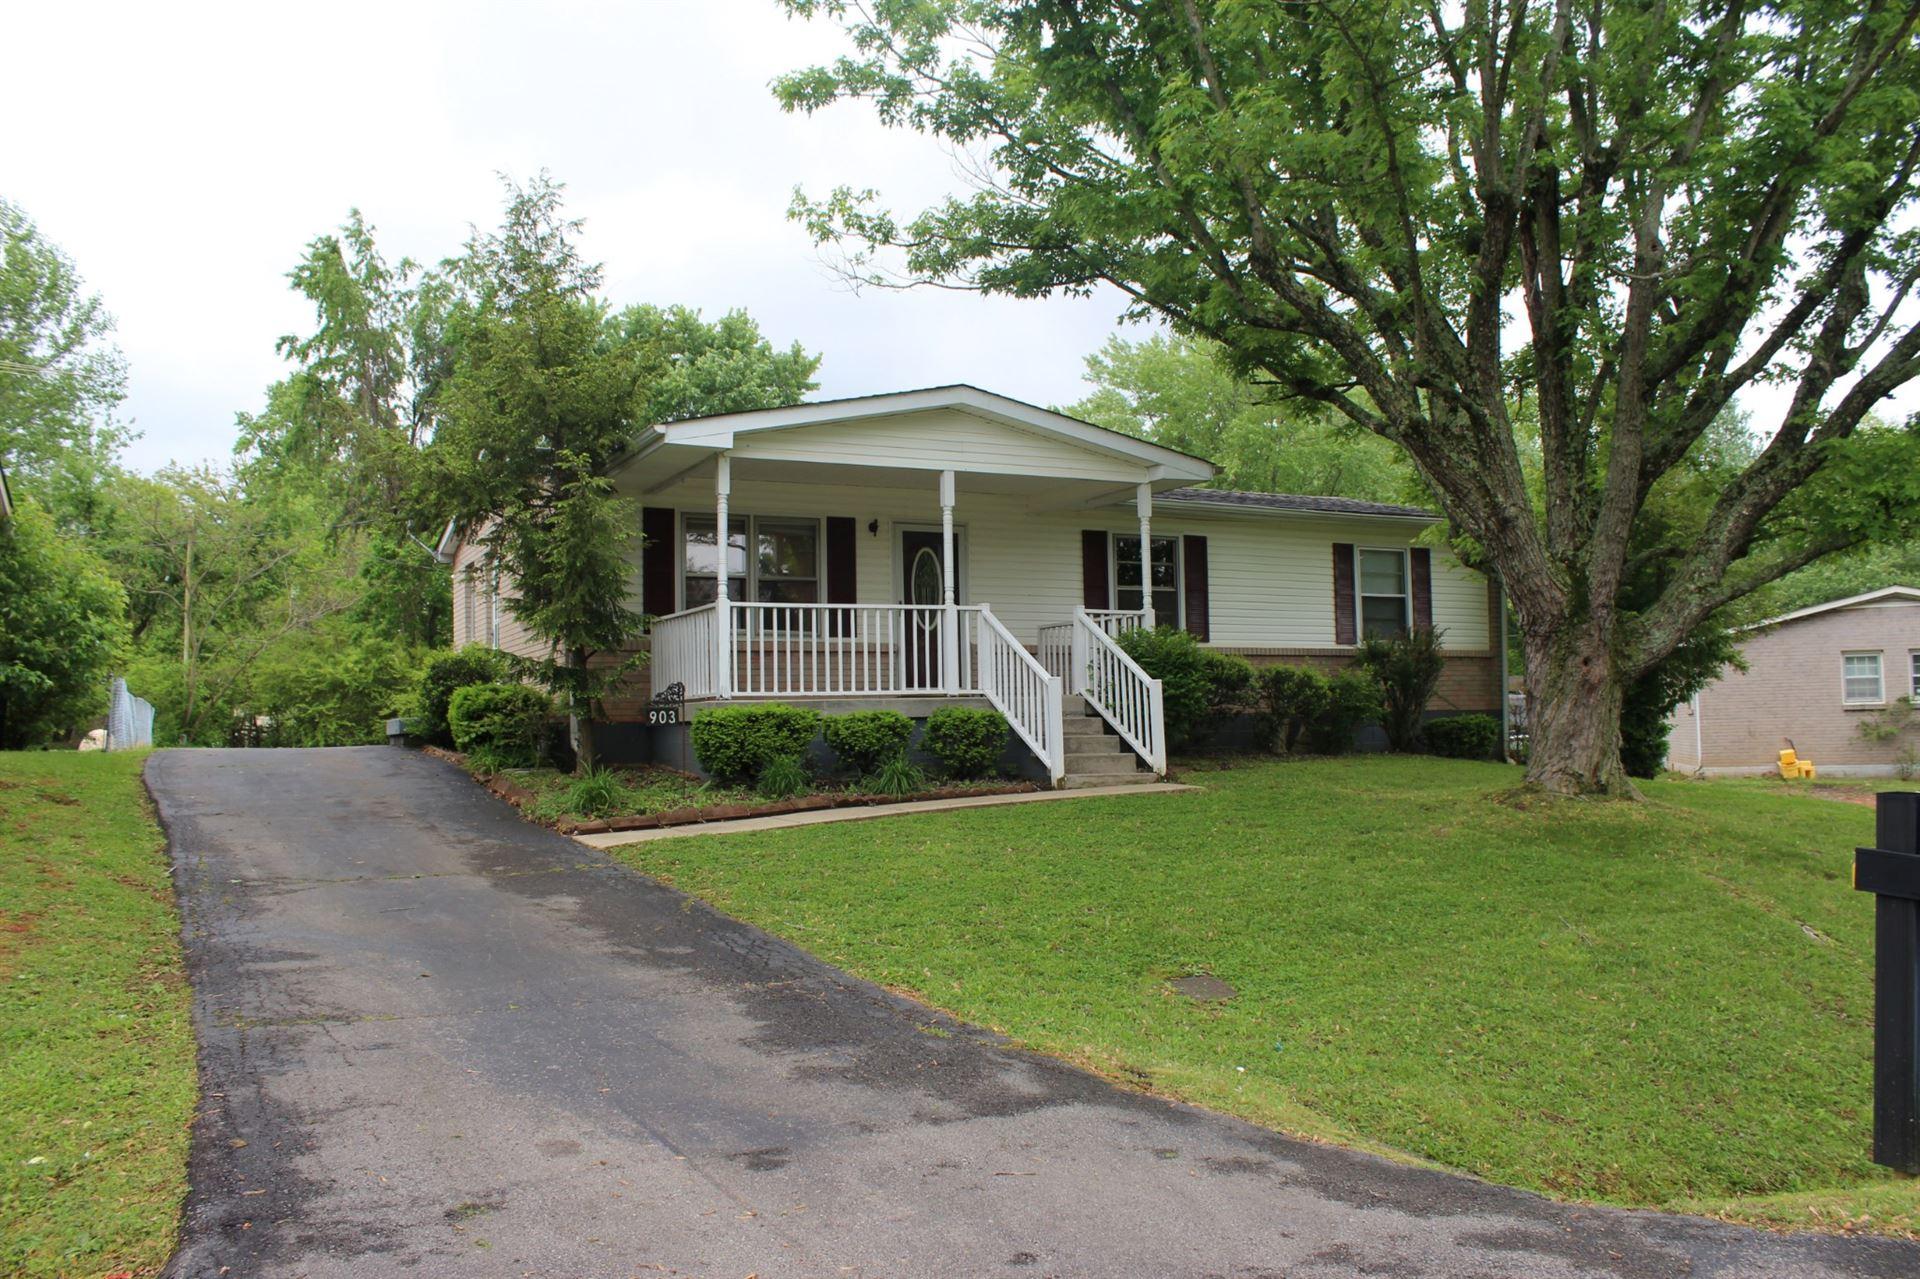 Photo of 903 Poplar Ave, Springfield, TN 37172 (MLS # 2250894)